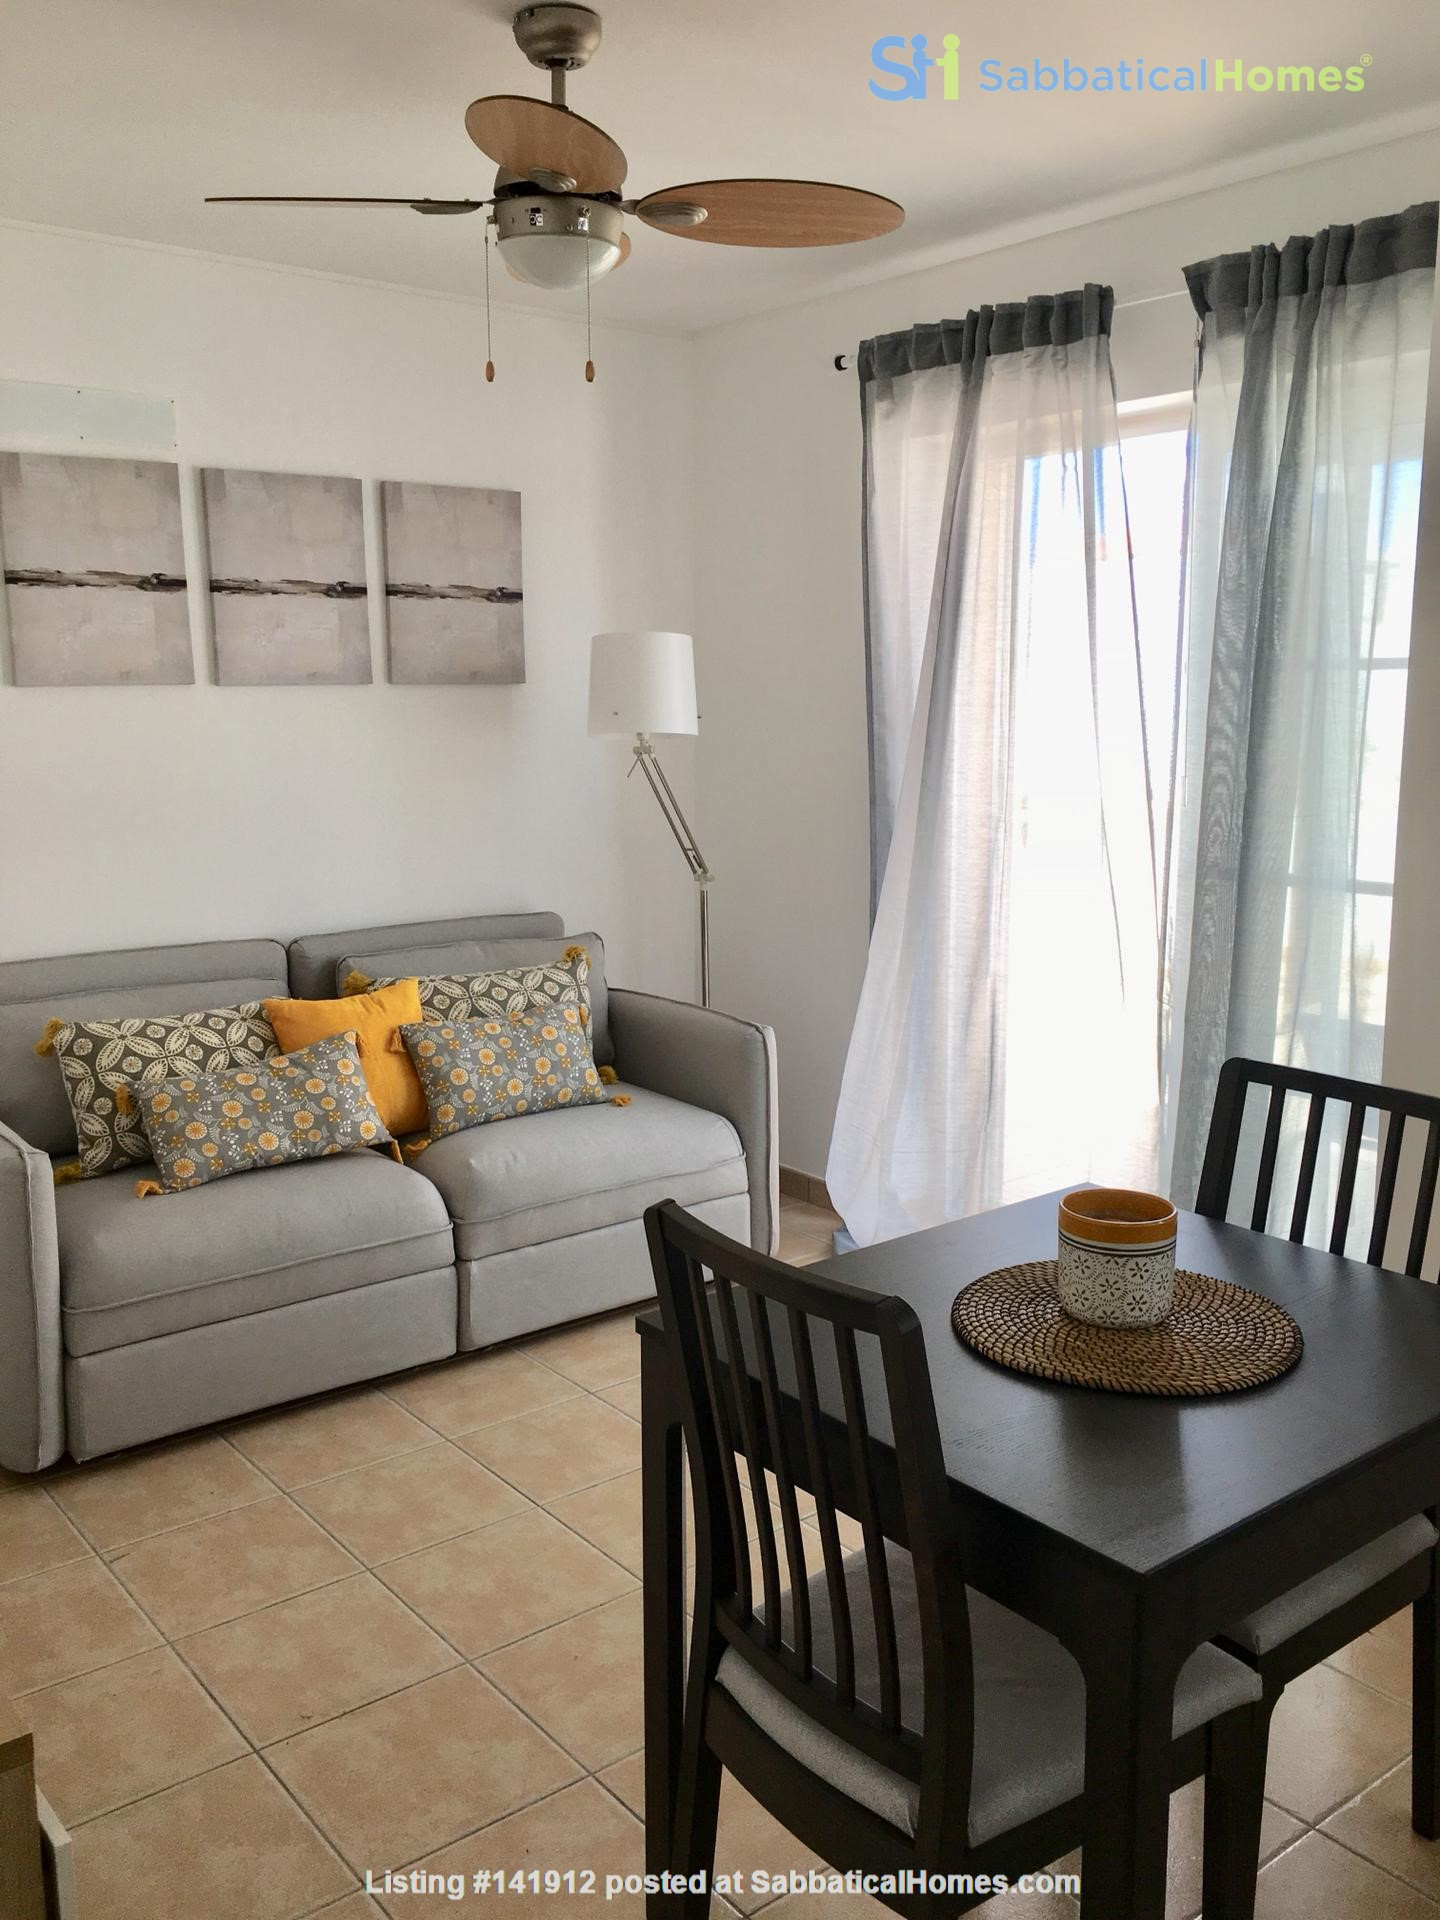 SUNNY ALGARVE PORTUGAL - 2 apartments available Home Rental in Tavira, Faro District, Portugal 1